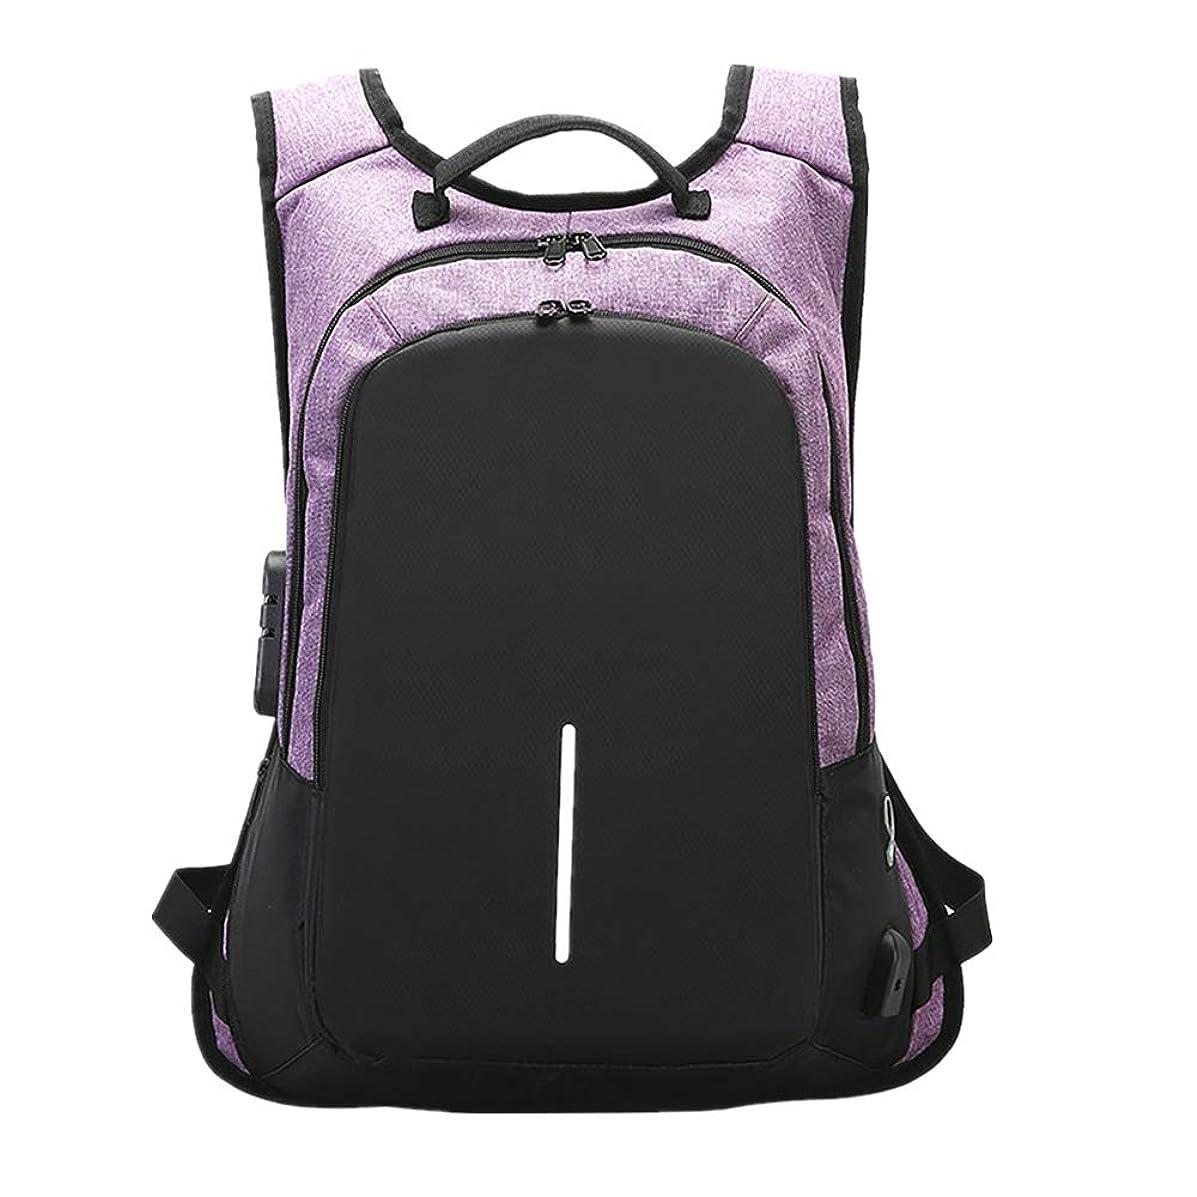 Business Backpack,Muranba 2019 USB Charging Password Lock Anti-Theft Backpack Men Women